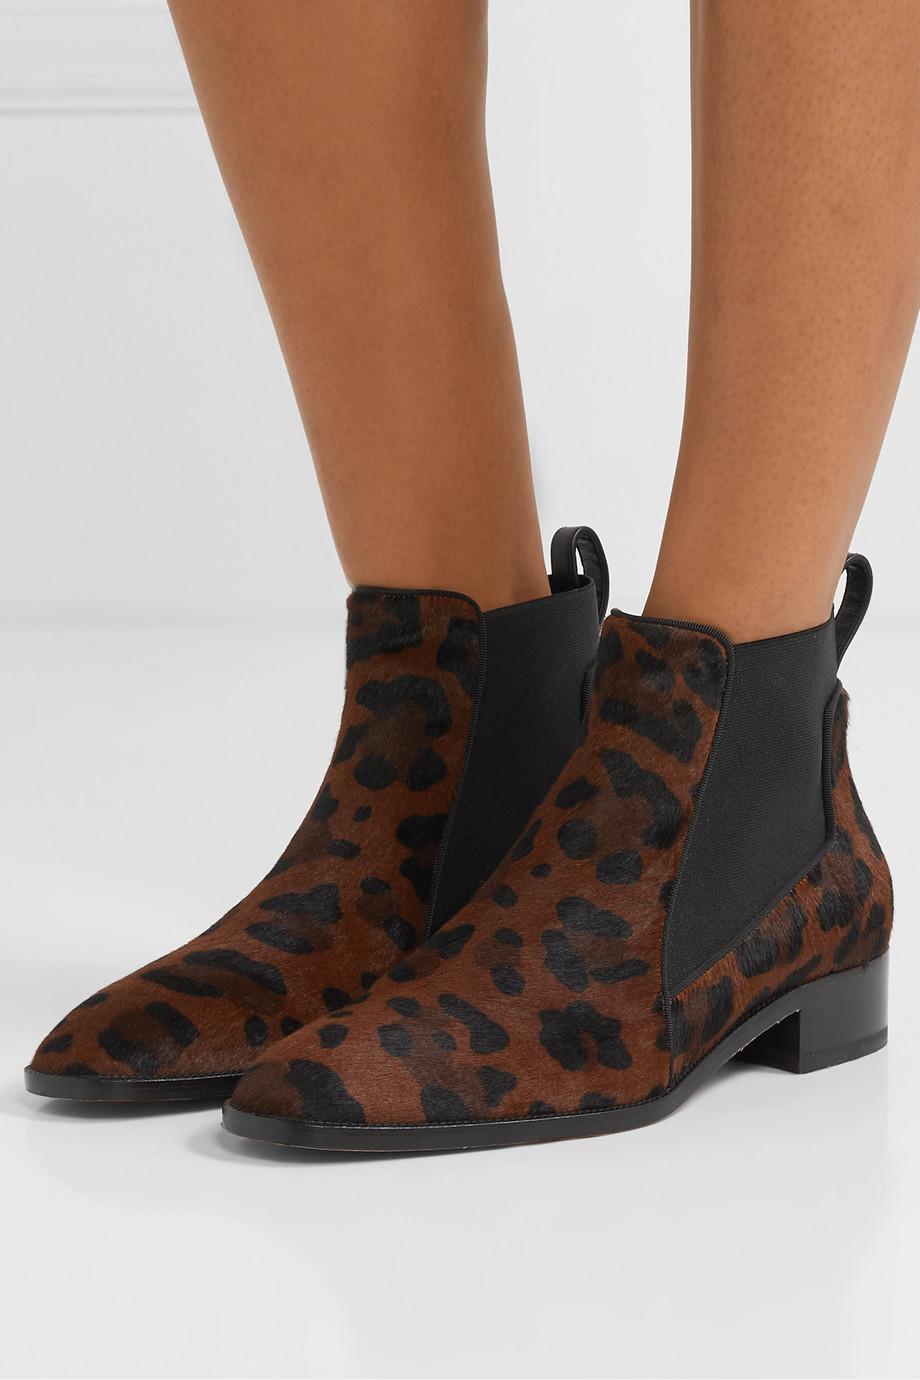 Christian Louboutin Marnmada 40 leopard-print calf hair Chelsea boots